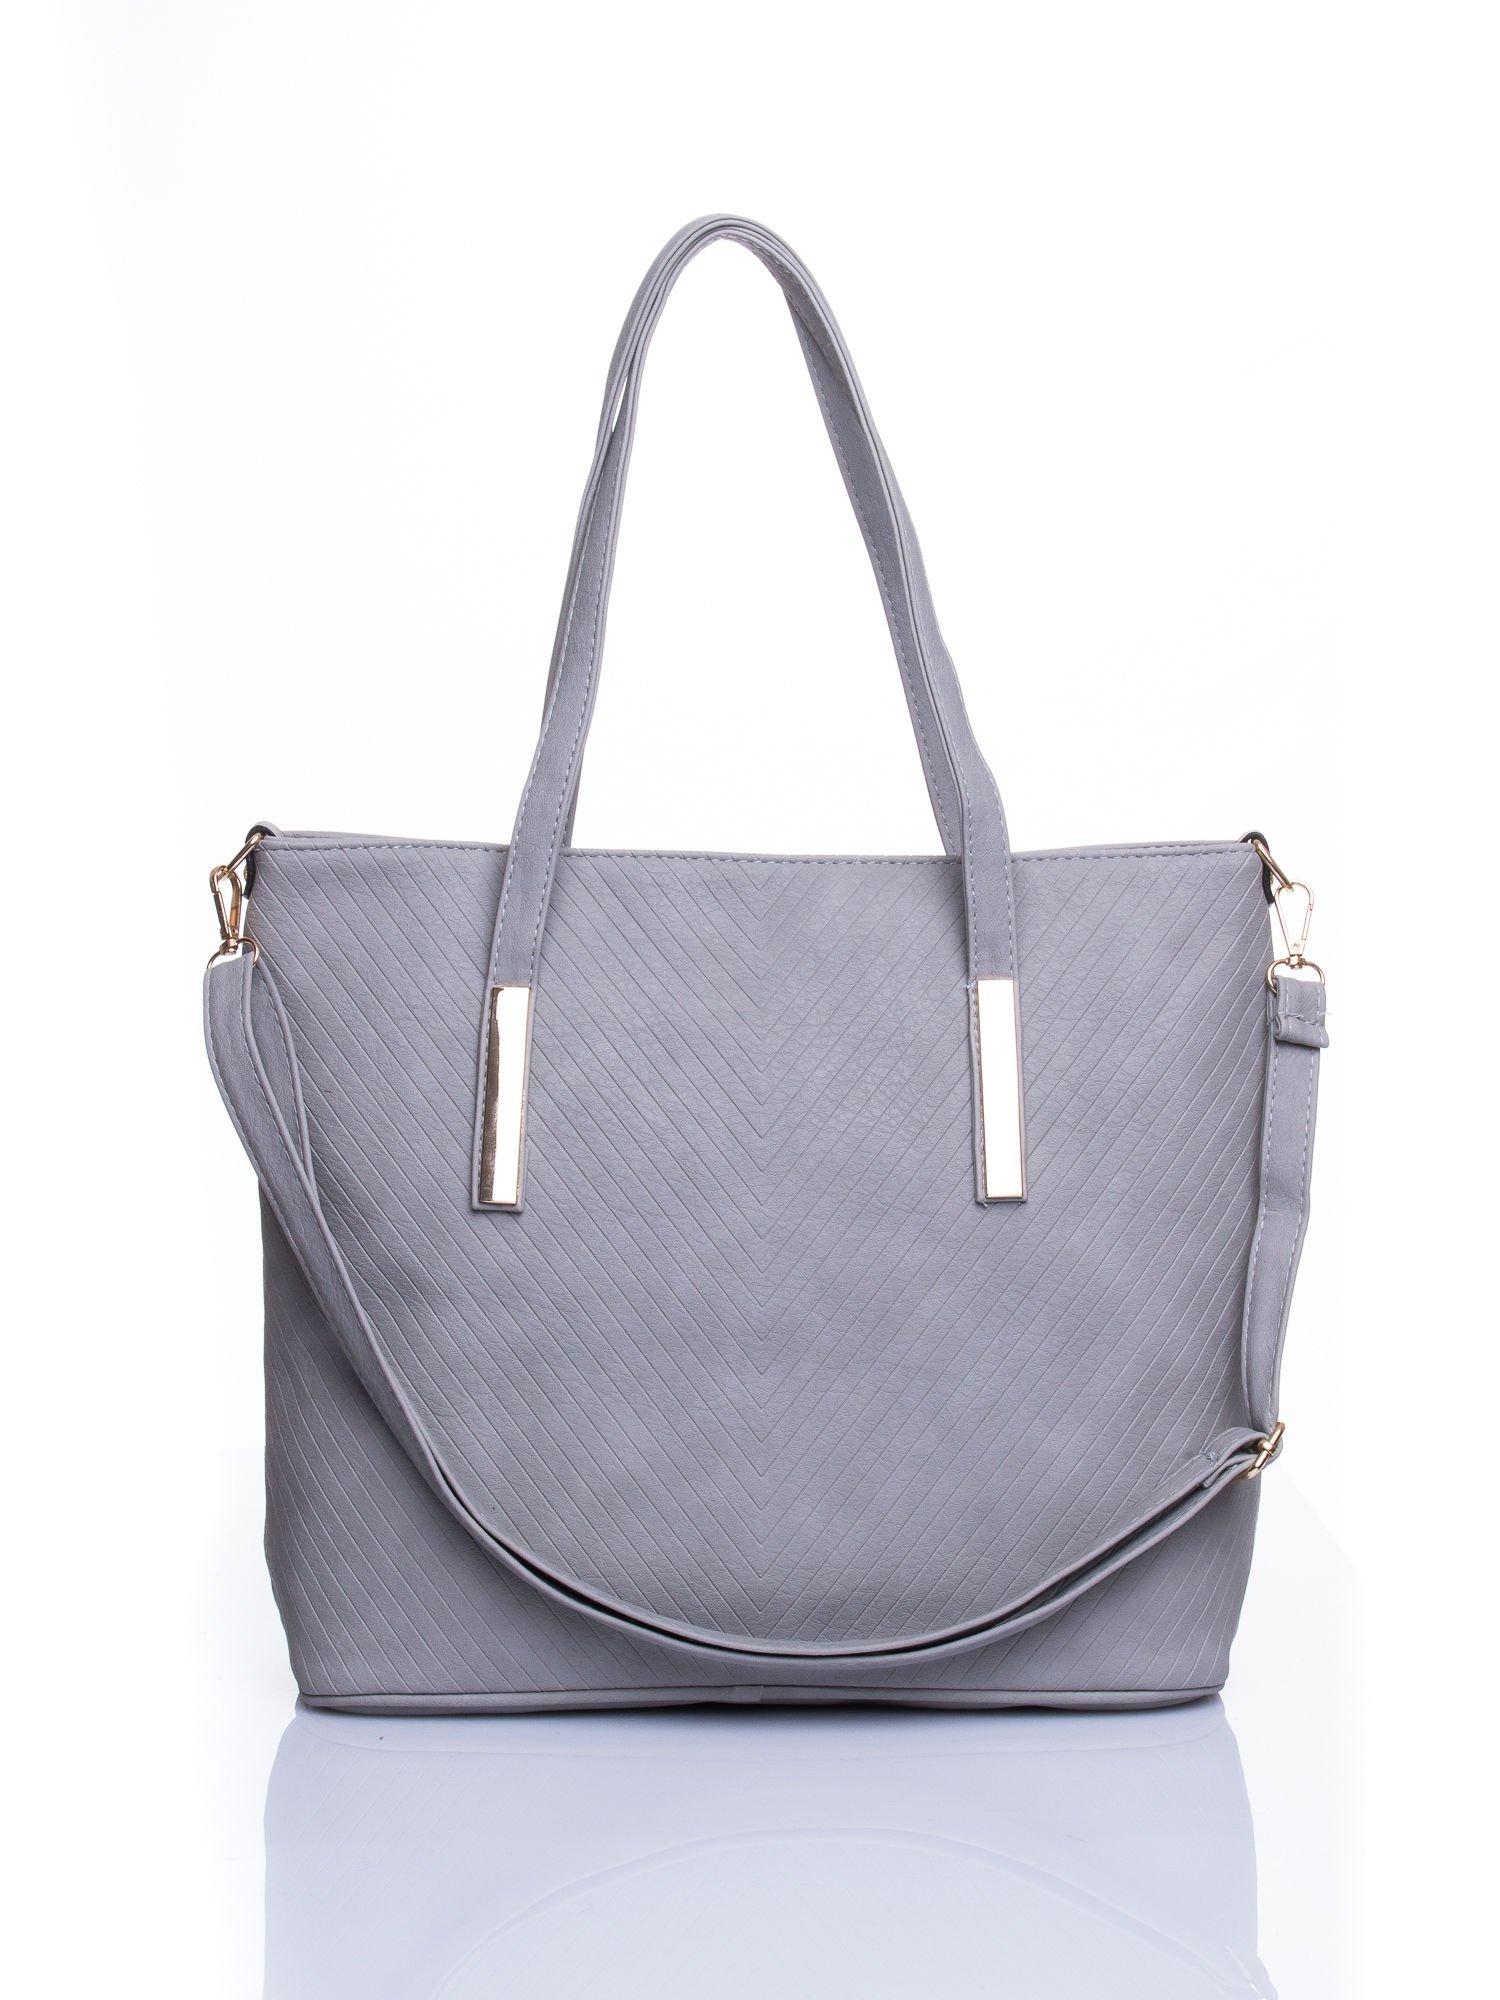 Szara fakturowana torba shopper bag                                  zdj.                                  1